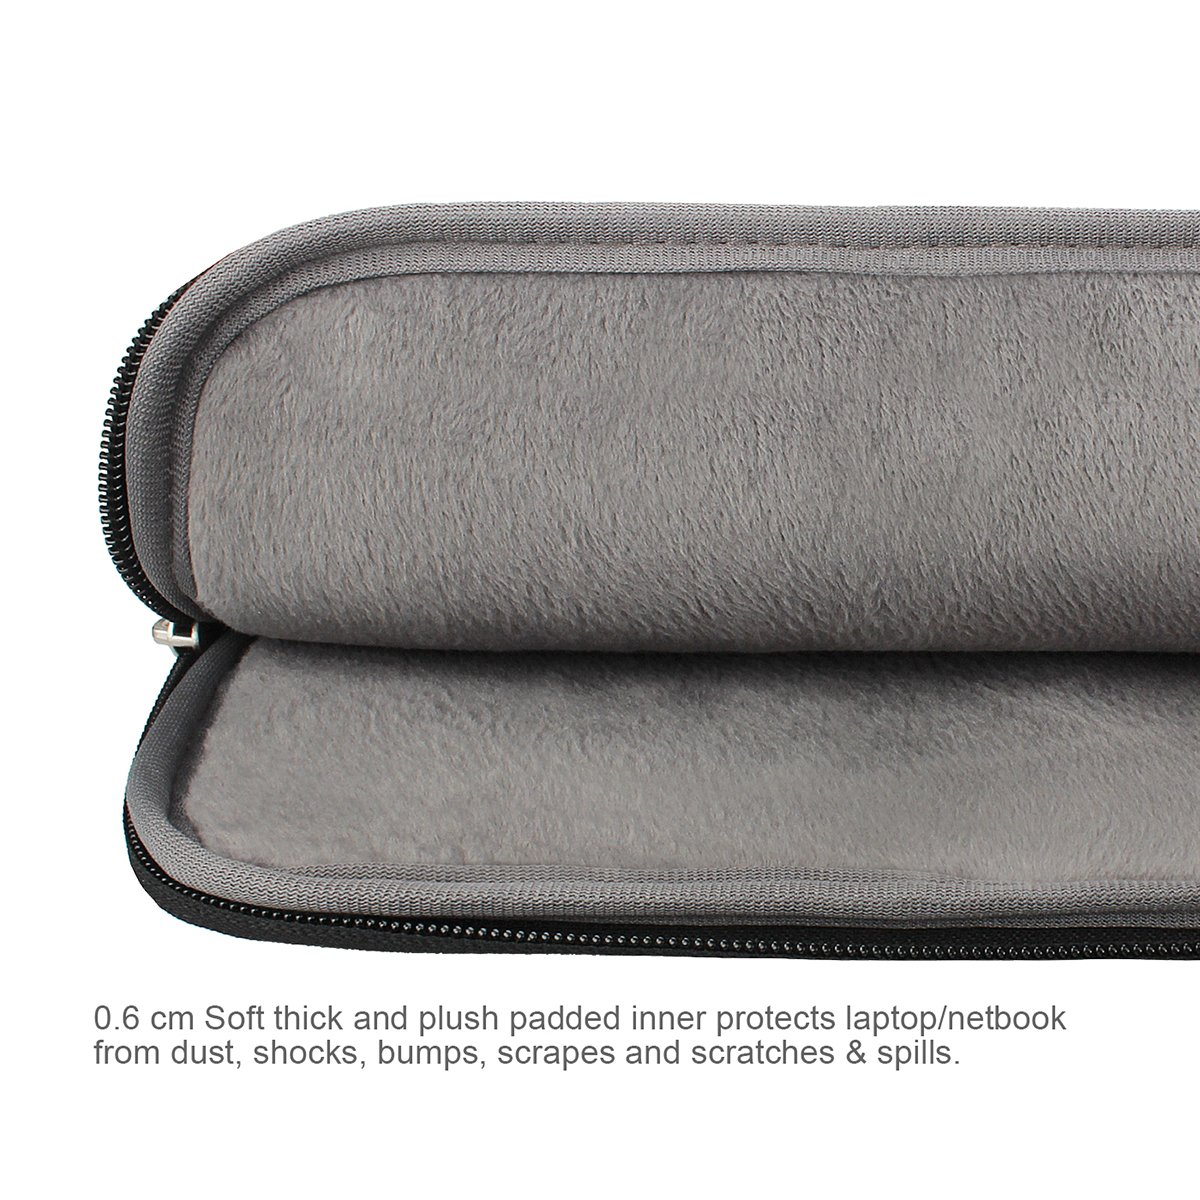 Arvok 15 15.6 Inch Multi-Color & Size Water-resistant Laptop Sleeve Bag with Handle/Notebook Computer Case/Ultrabook Briefcase Carrying Bag, Black by ARVOK (Image #4)